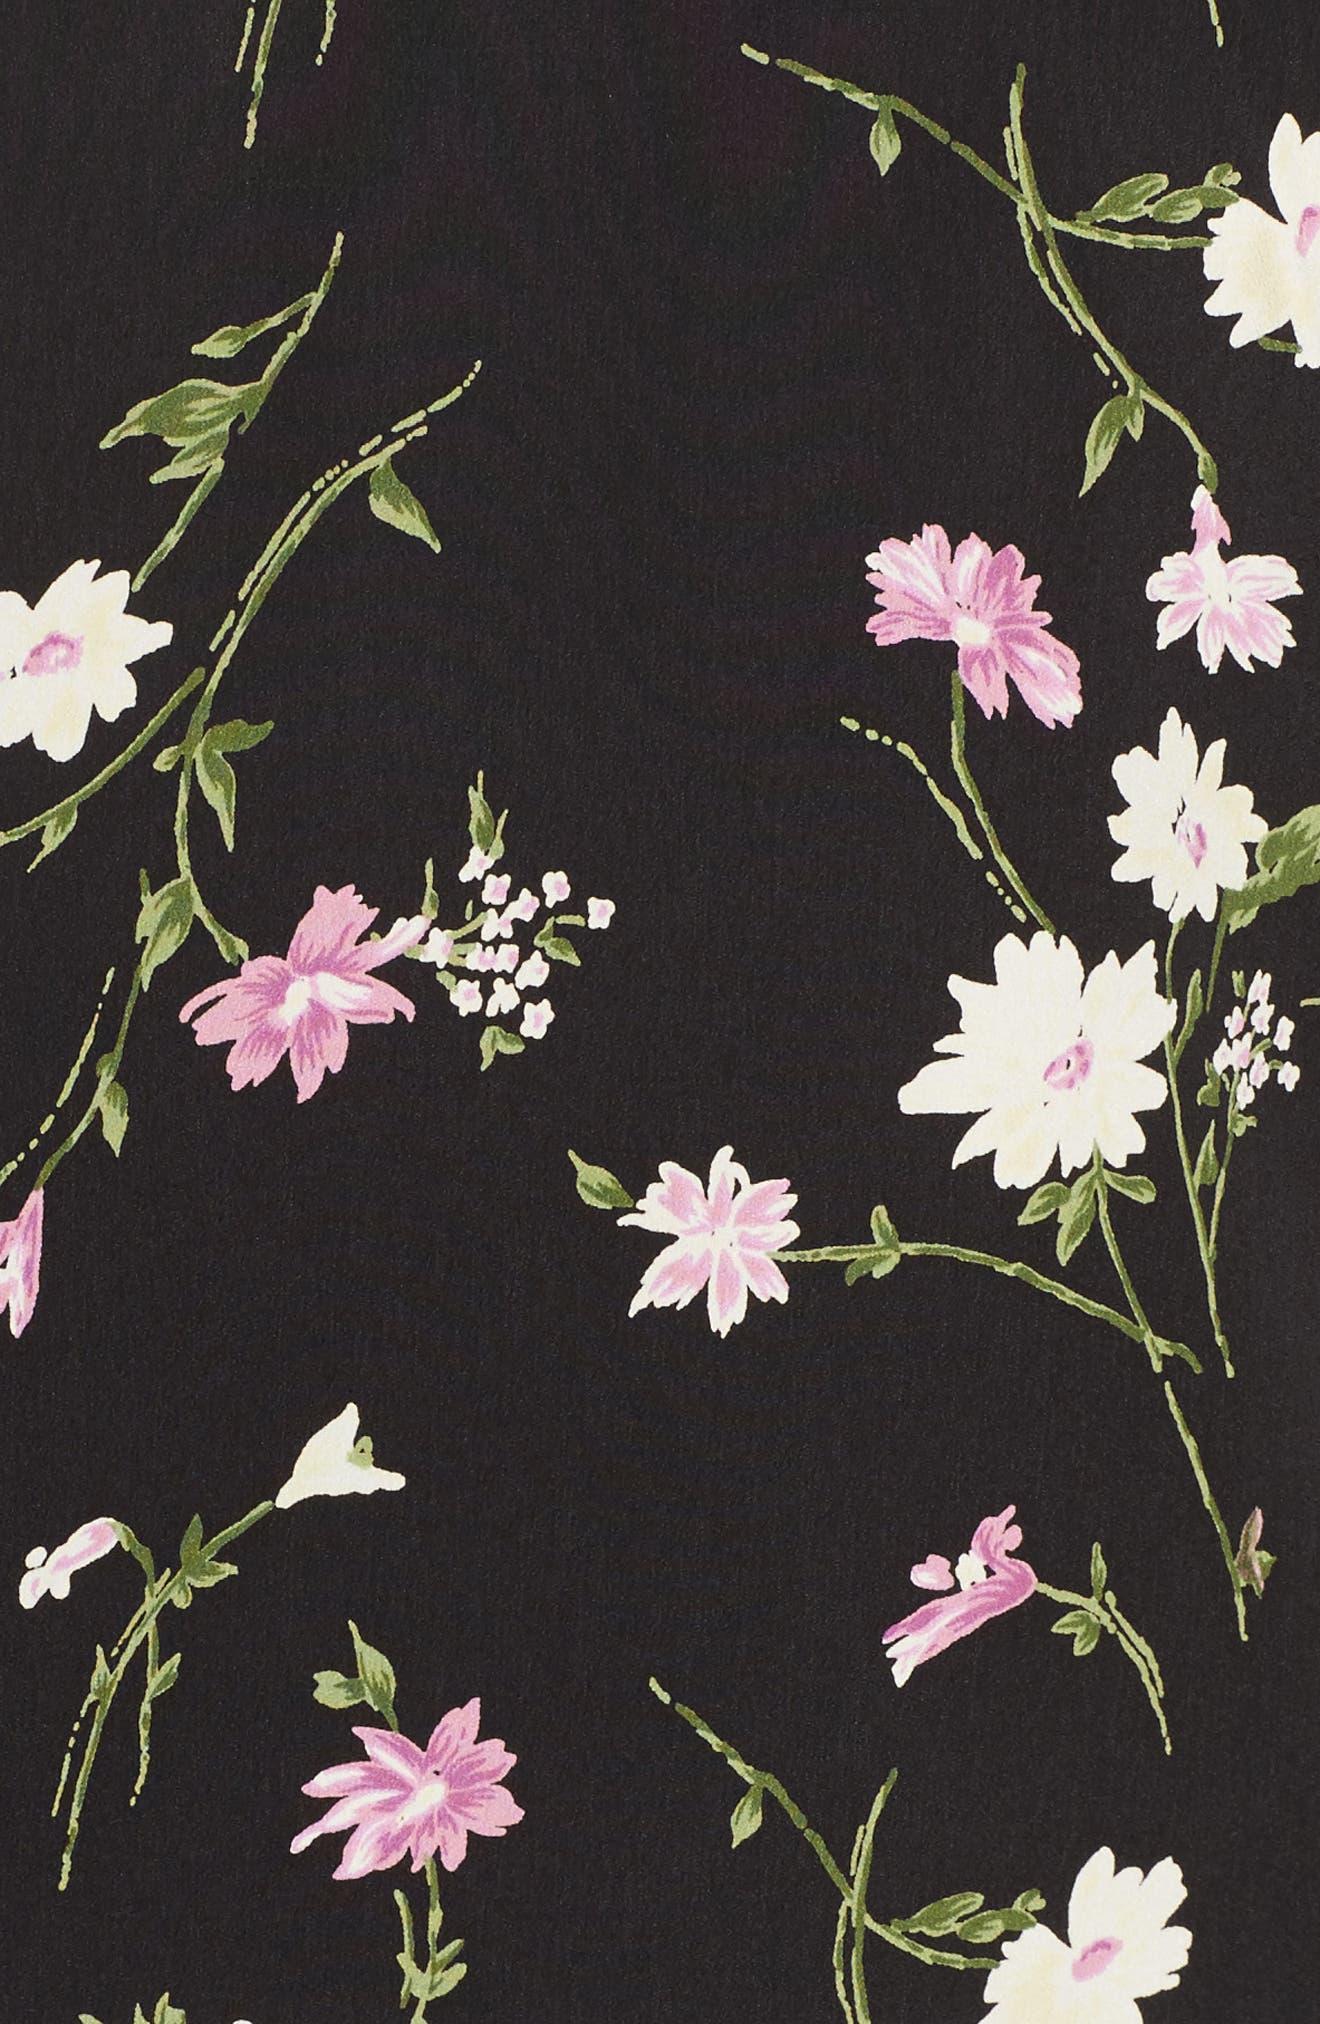 Tie Back Flutter Sleeve Top,                             Alternate thumbnail 5, color,                             001